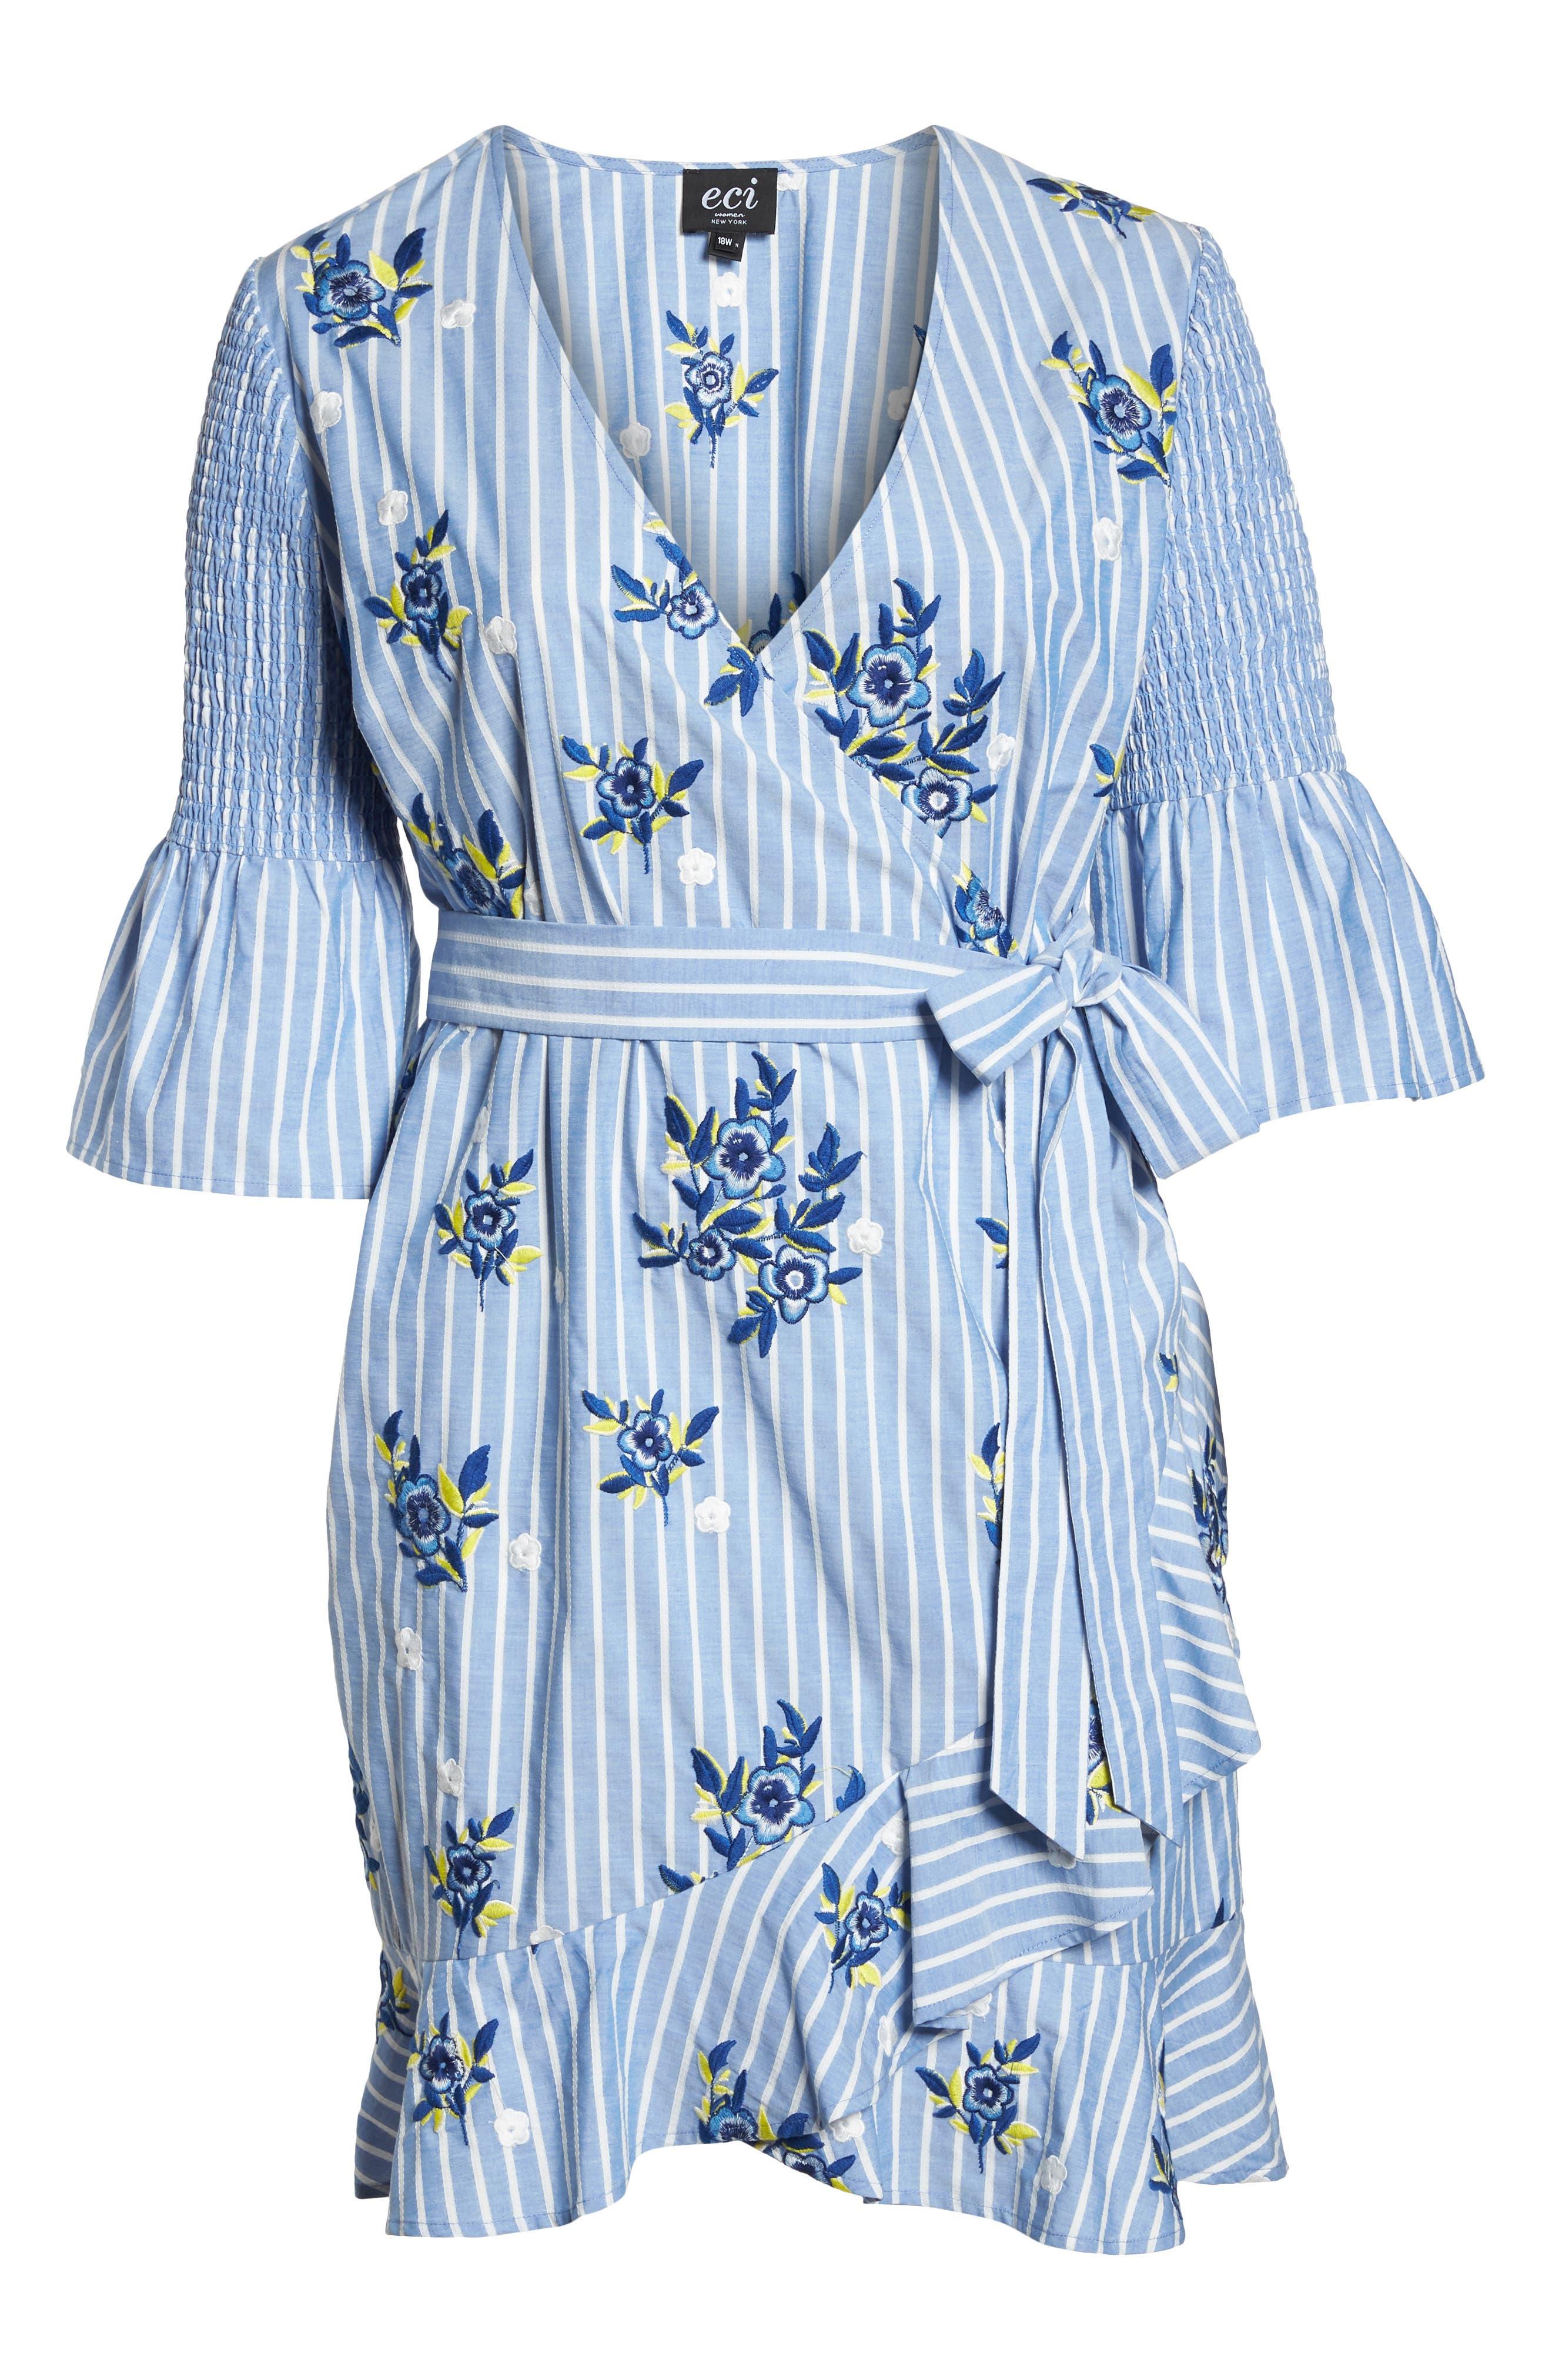 Embroidered Stripe Wrap Dress,                             Alternate thumbnail 7, color,                             BLUE/ WHITE